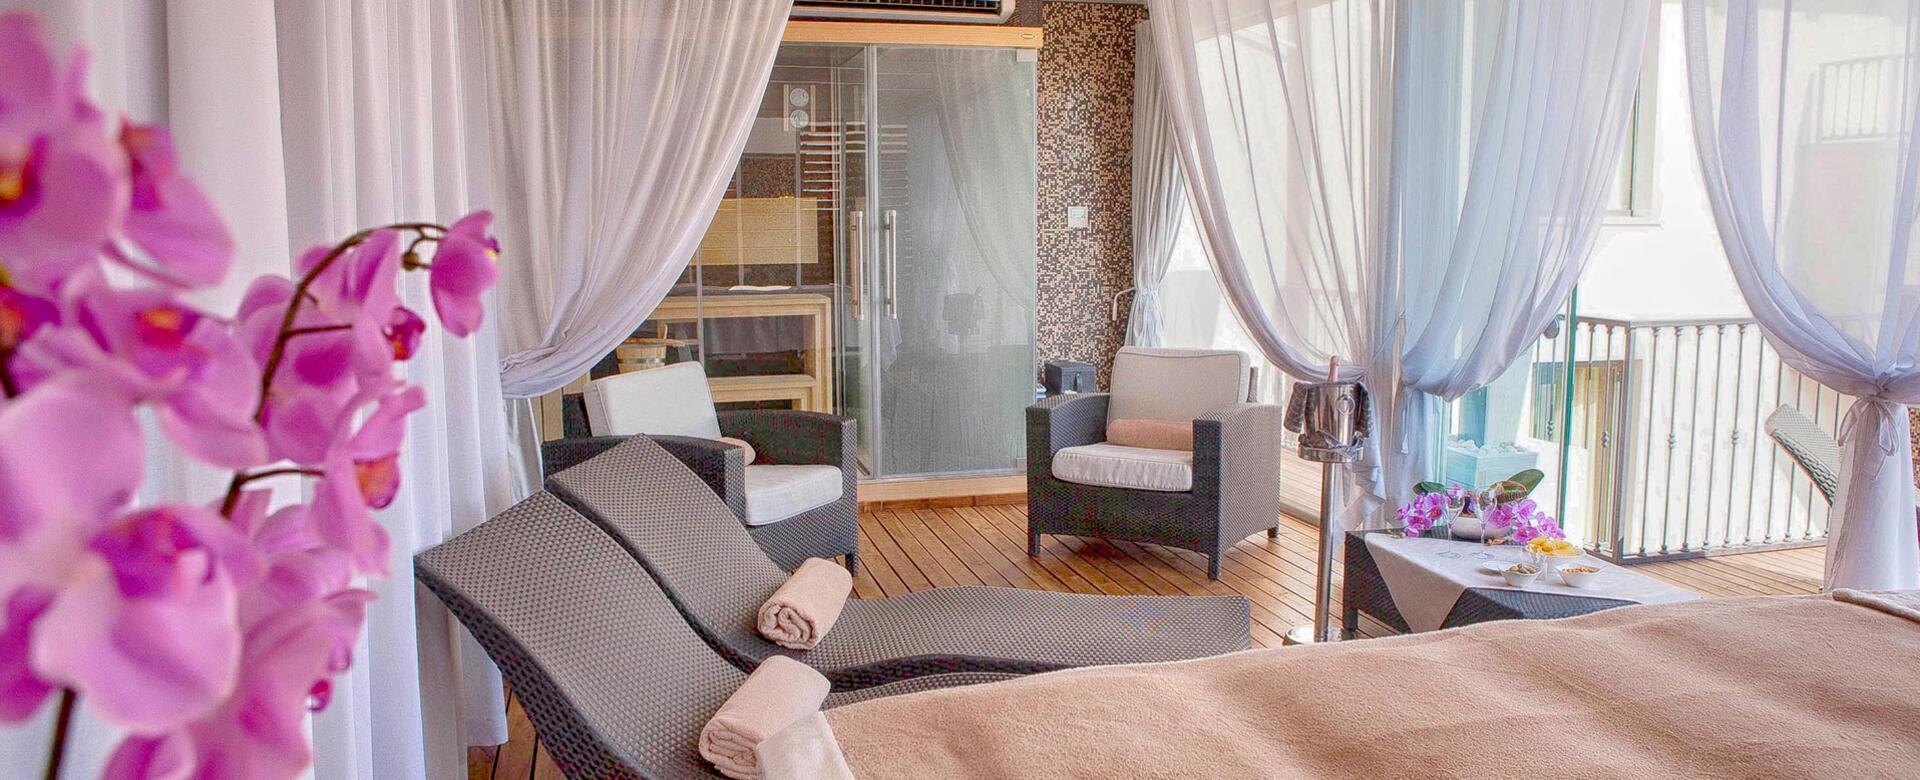 hotelvillaluisa en private-spa 004